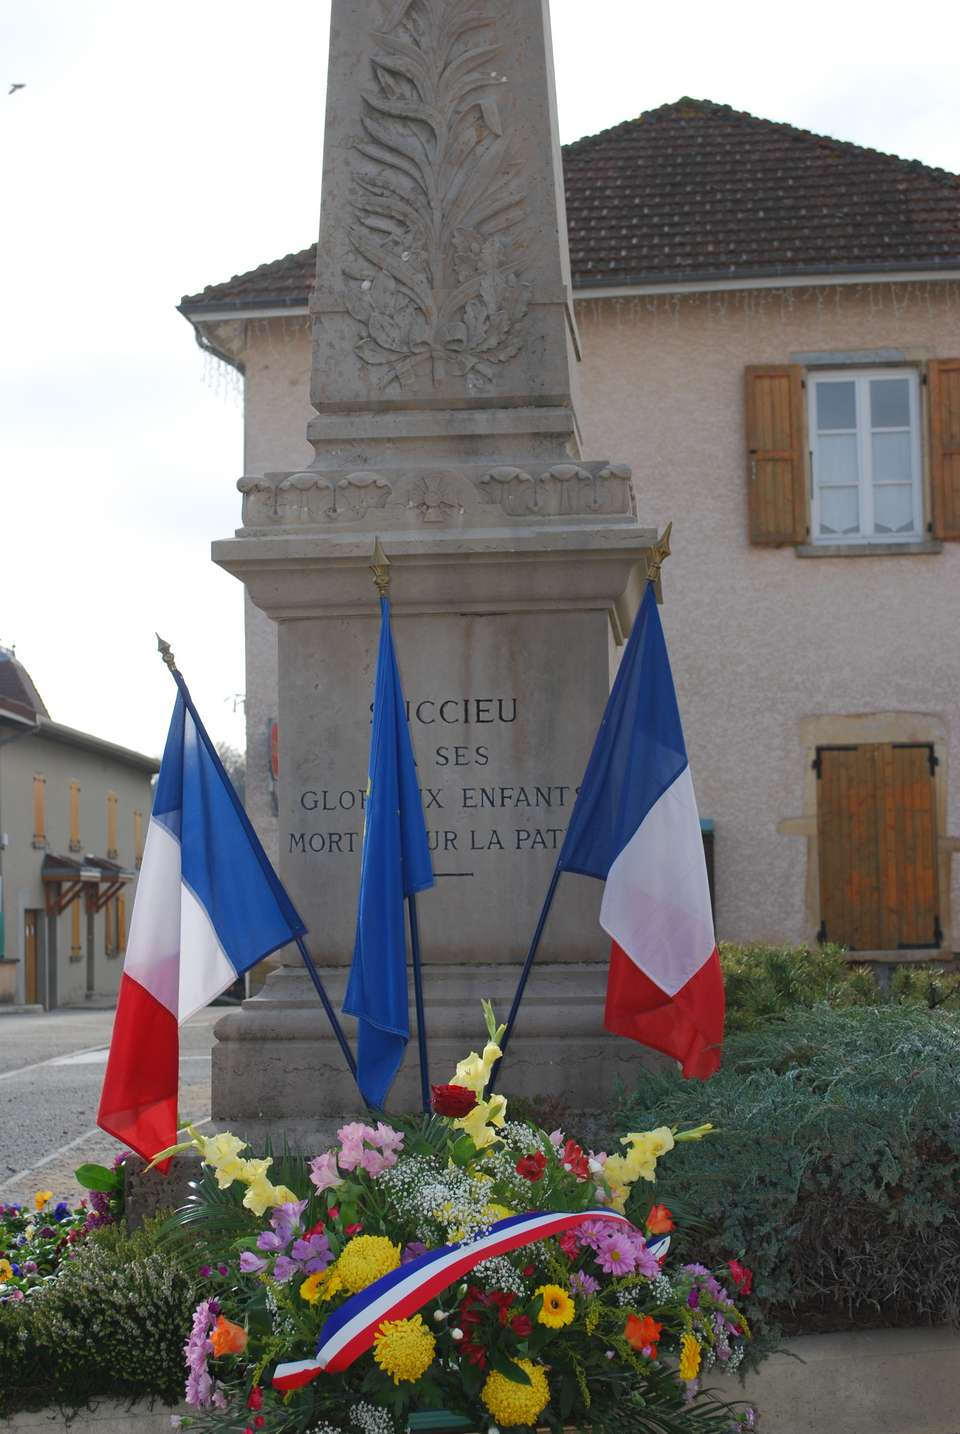 le-monument-decore-a-succieu-11-novembre-2015